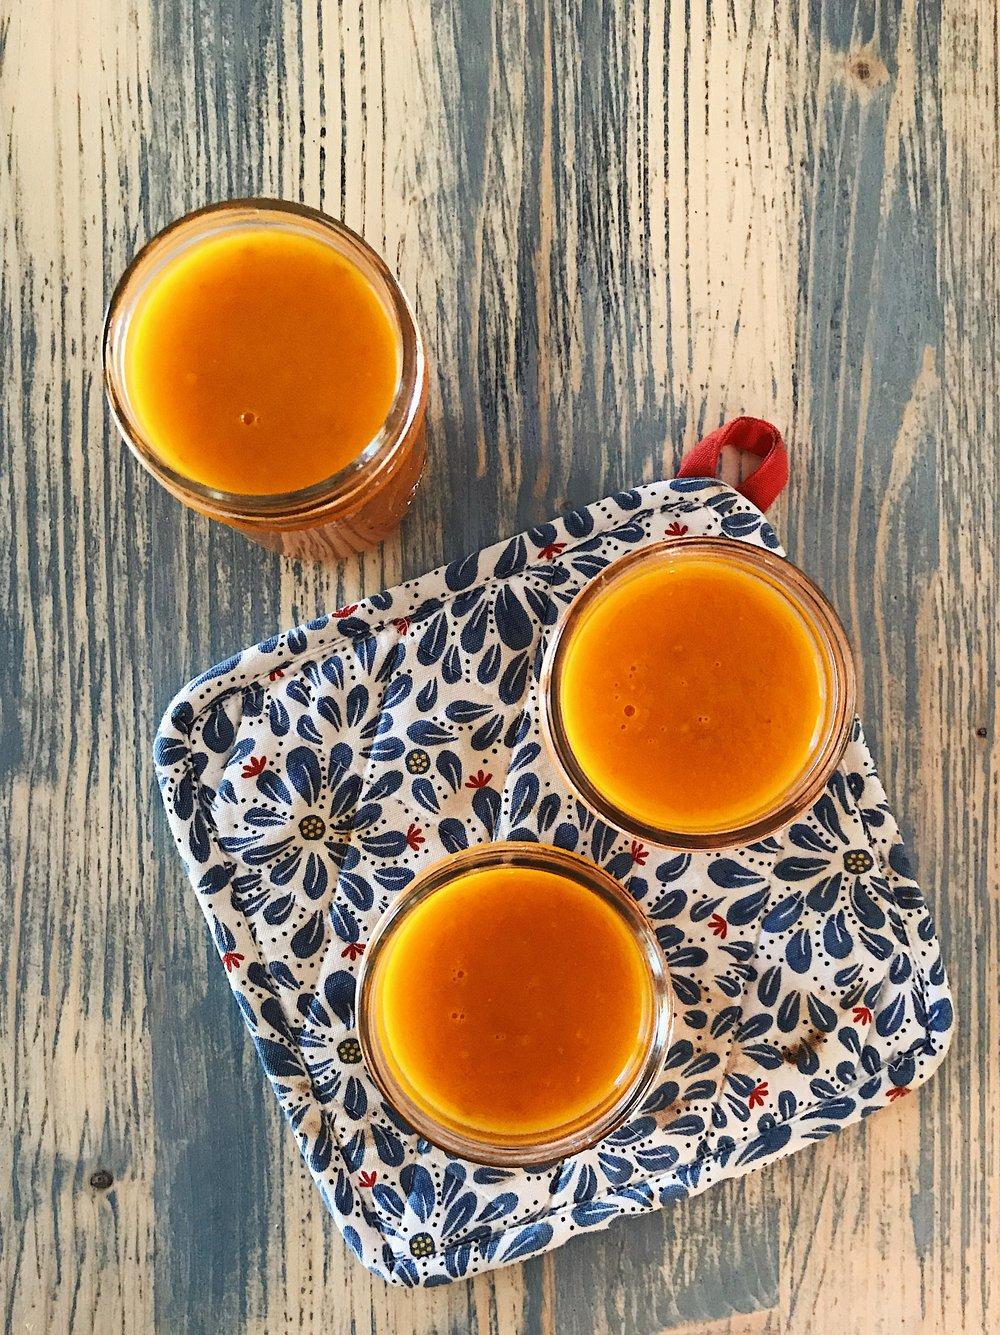 Basic Tomato Sauce | RafaellaSargi.com